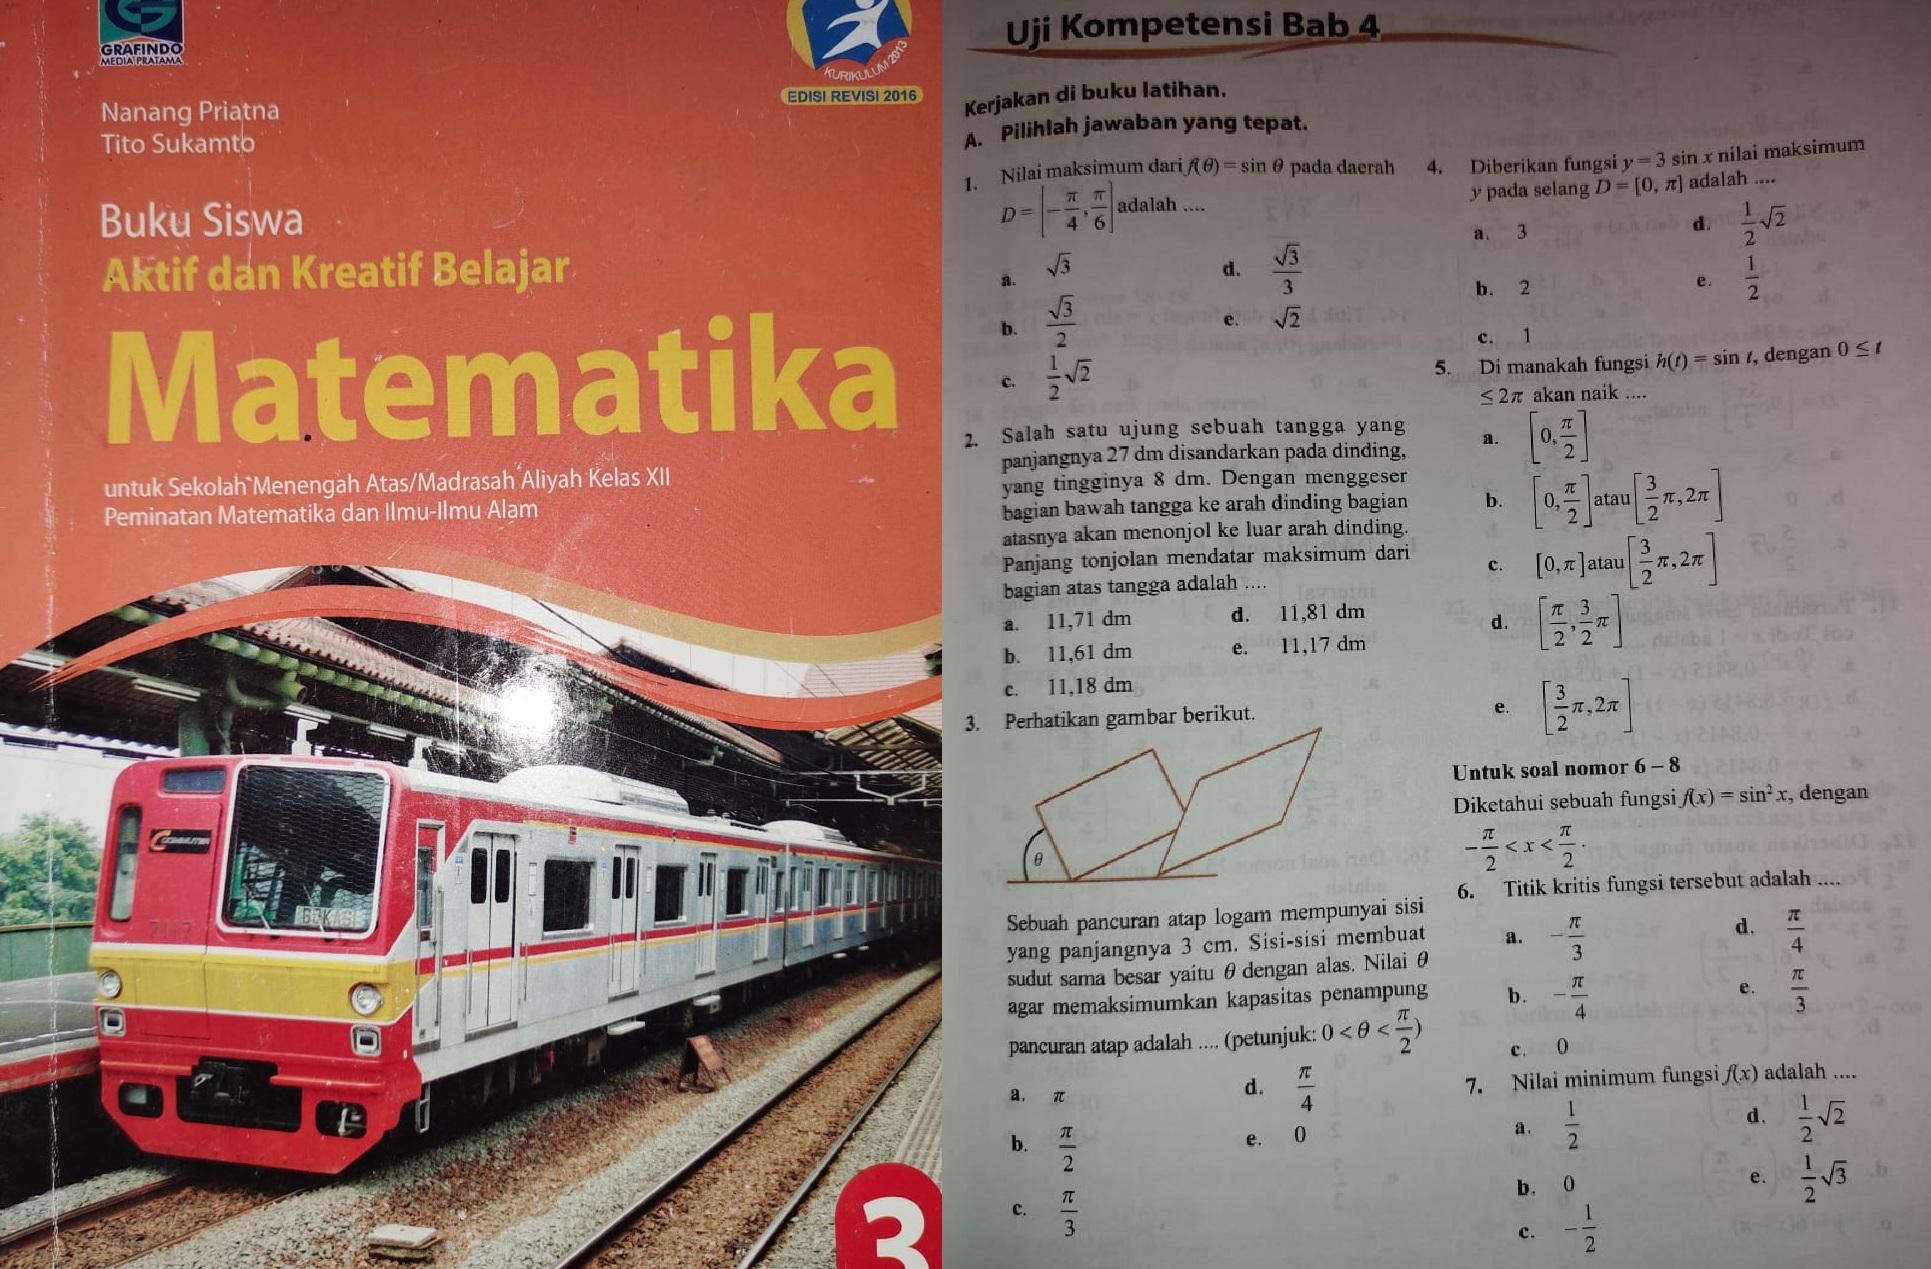 Soal dan Pembahasan Turunan Fungsi Trigonometri (*Sumber Soal Uji Kompetensi Buku Matematika Peminatan Kelas XII)